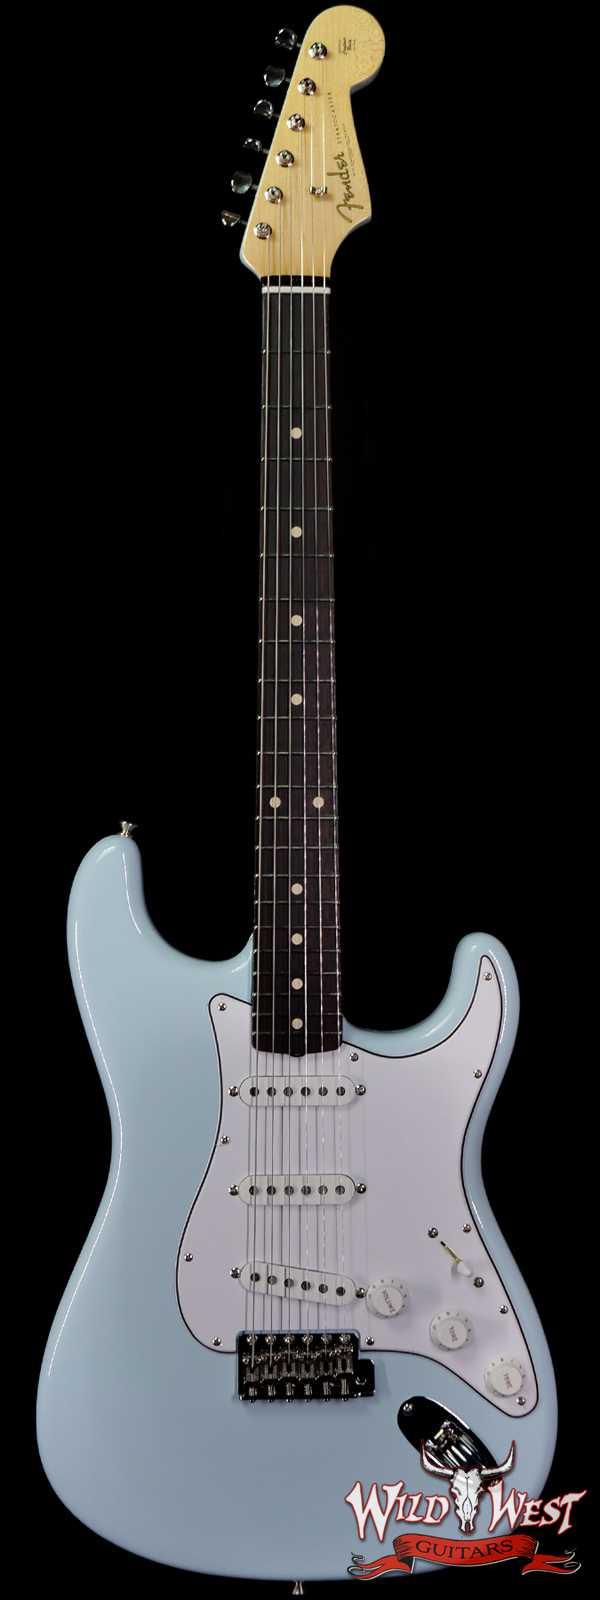 Fender Custom Shop 1961 Stratocaster NOS Hand-Wound Pickups Matching Color Neck Sonic Blue